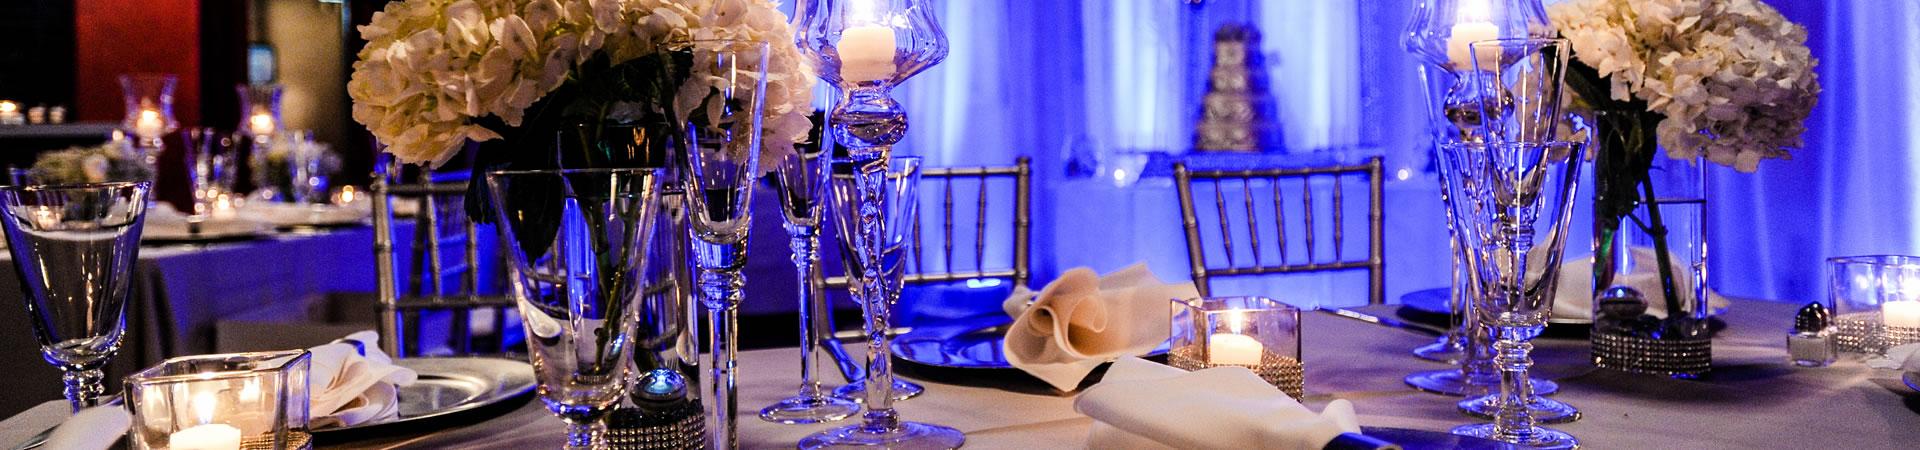 winter-wonderland-themed-catering